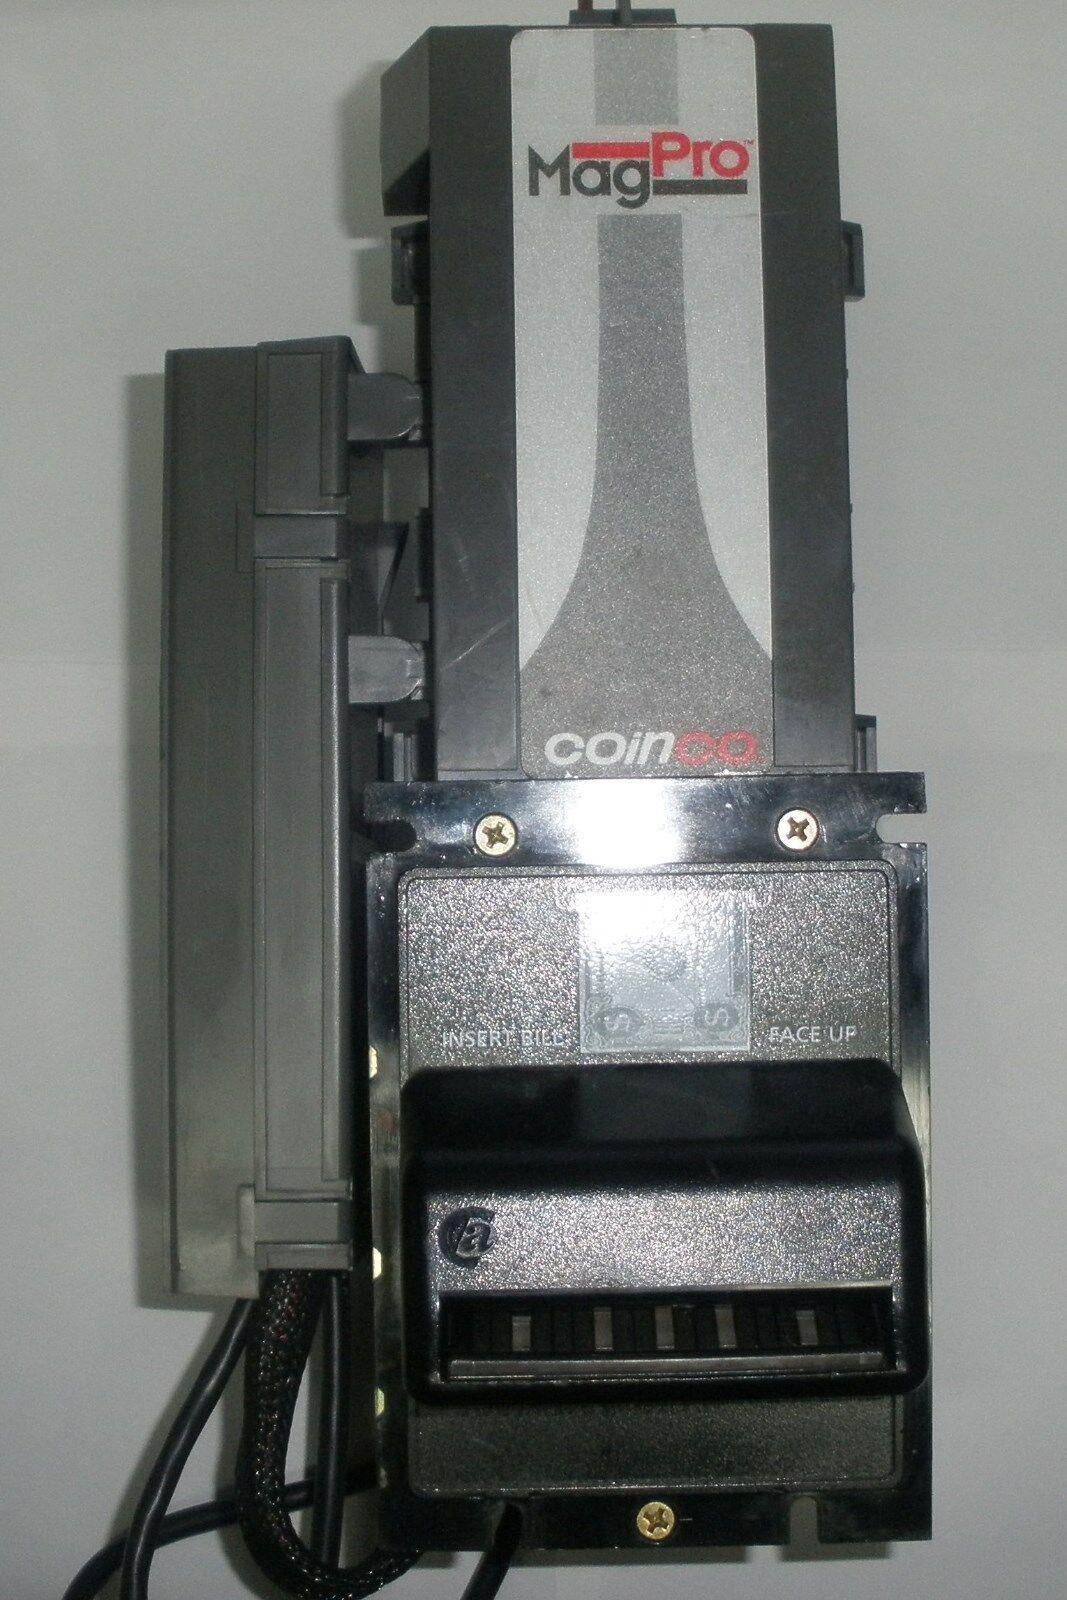 Coinco MAG30B MagPro Bill Acceptor/Validator For Vending Machine BA30B BA50 NBB